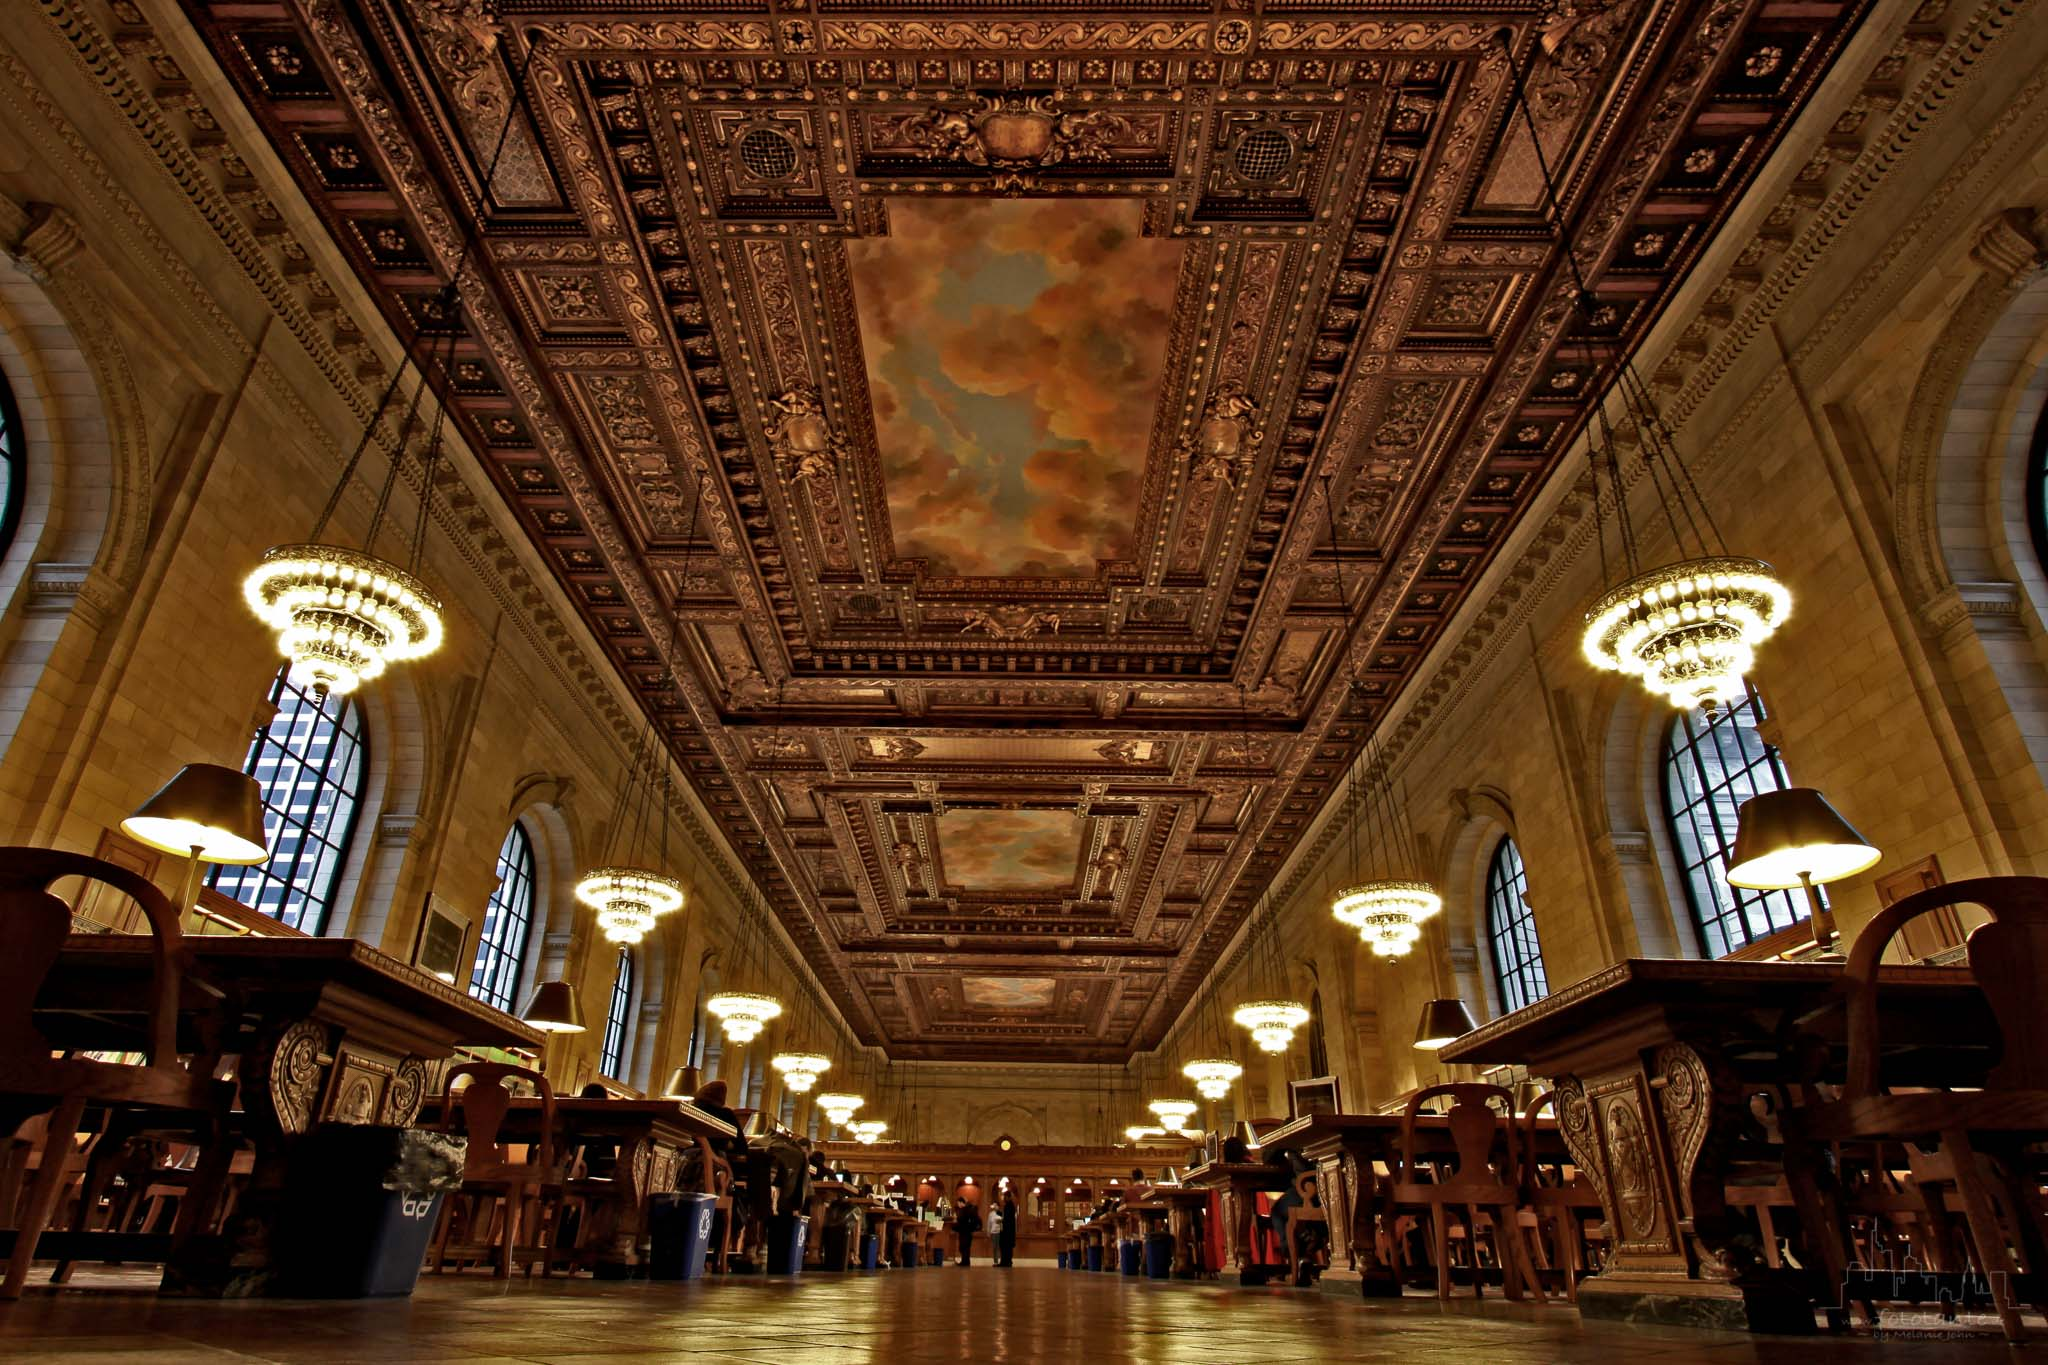 Public Library, USA